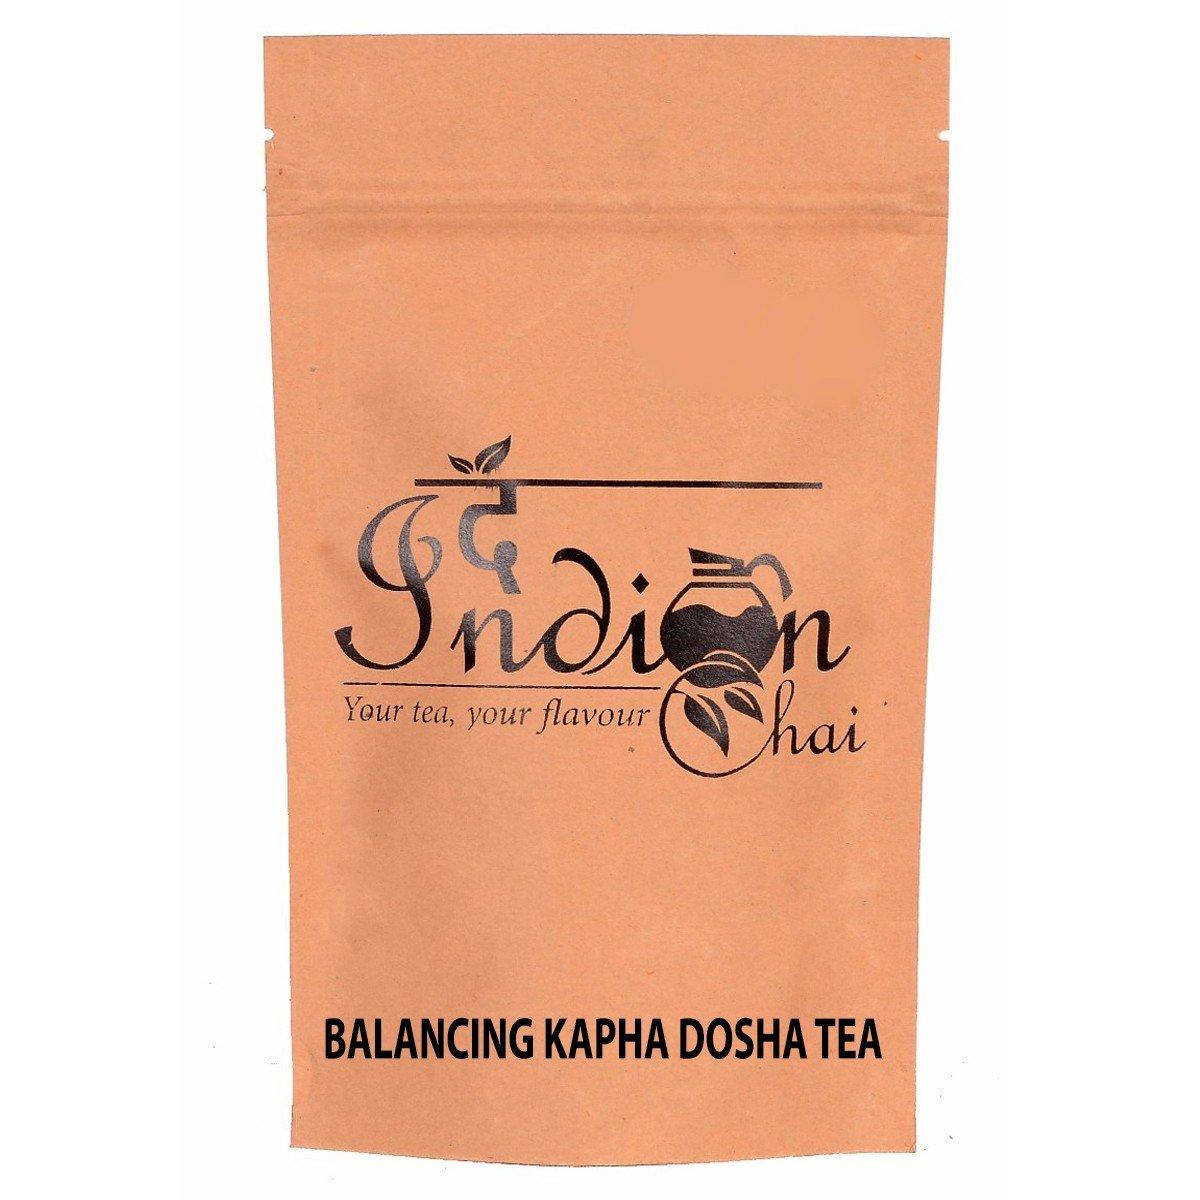 The Indian Chai - Balancing Kapha Dosha Ayurvedic Tea 100g